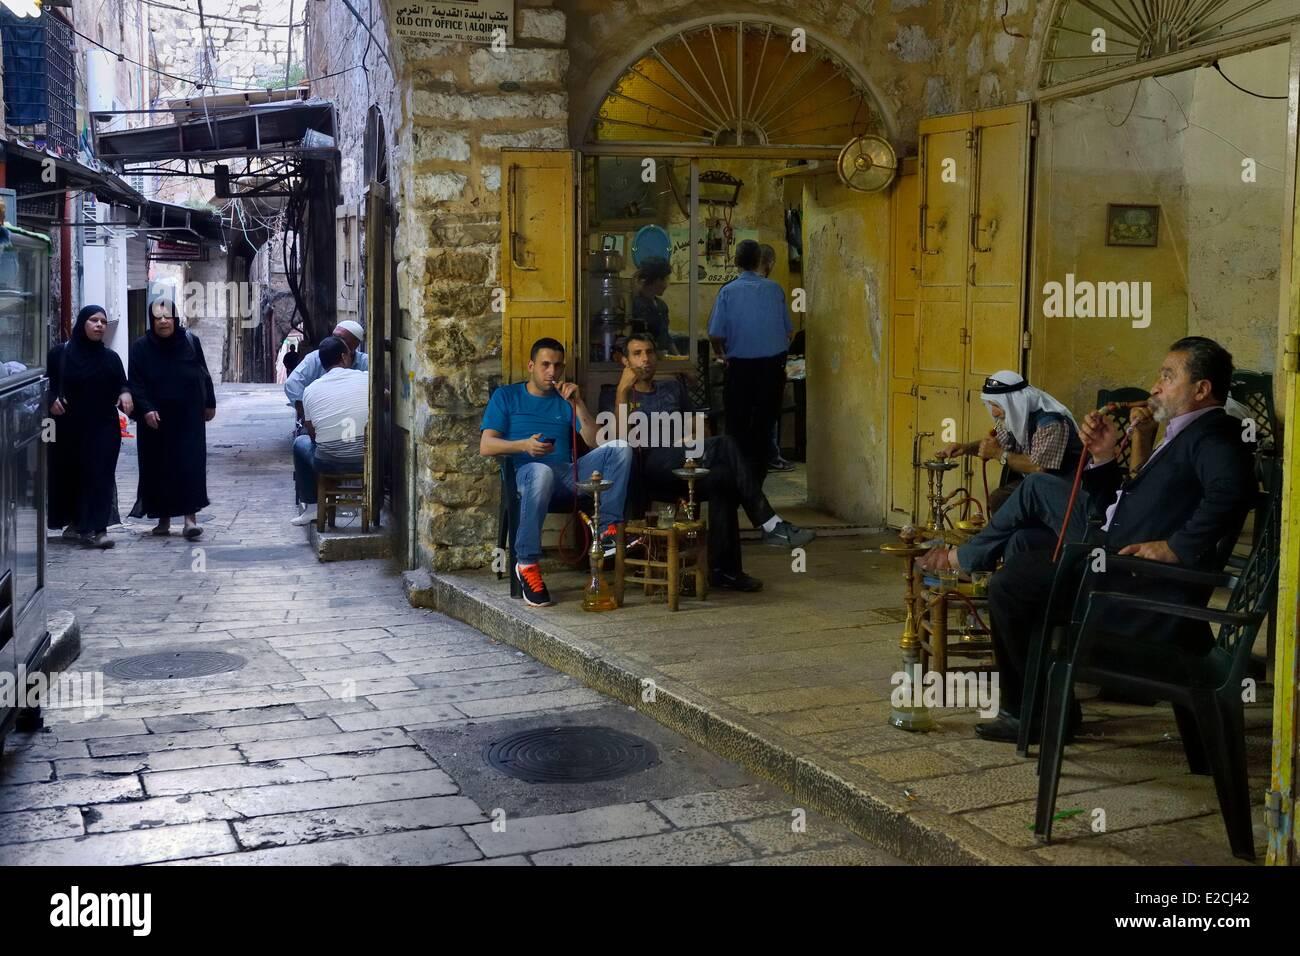 Israel, Jerusalem, heilige Stadt, die Altstadt von der UNESCO als Welterbe gelistet Stockbild